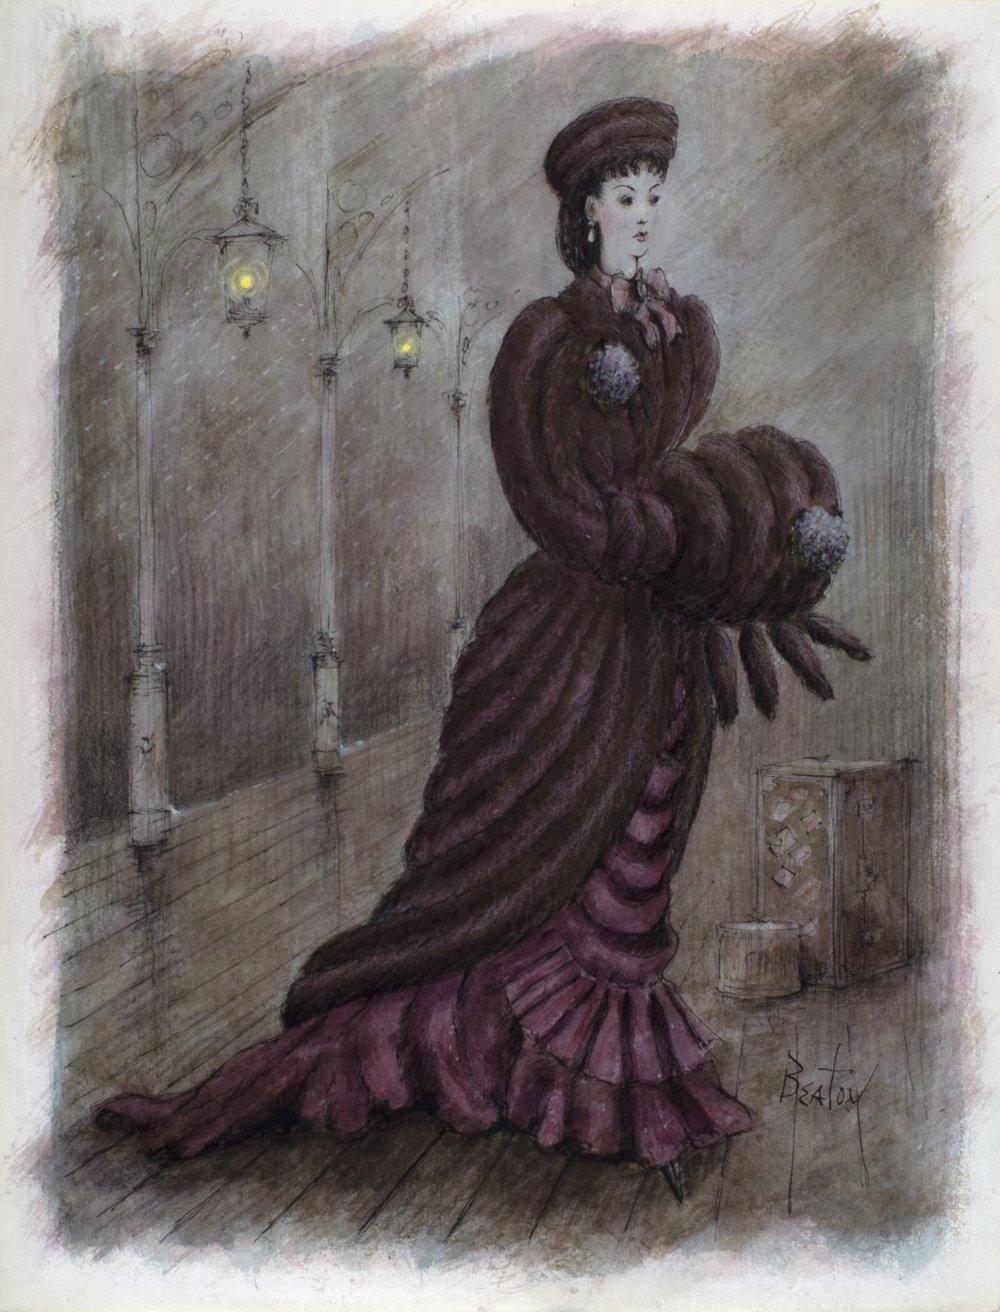 Anna Karenina (1948)